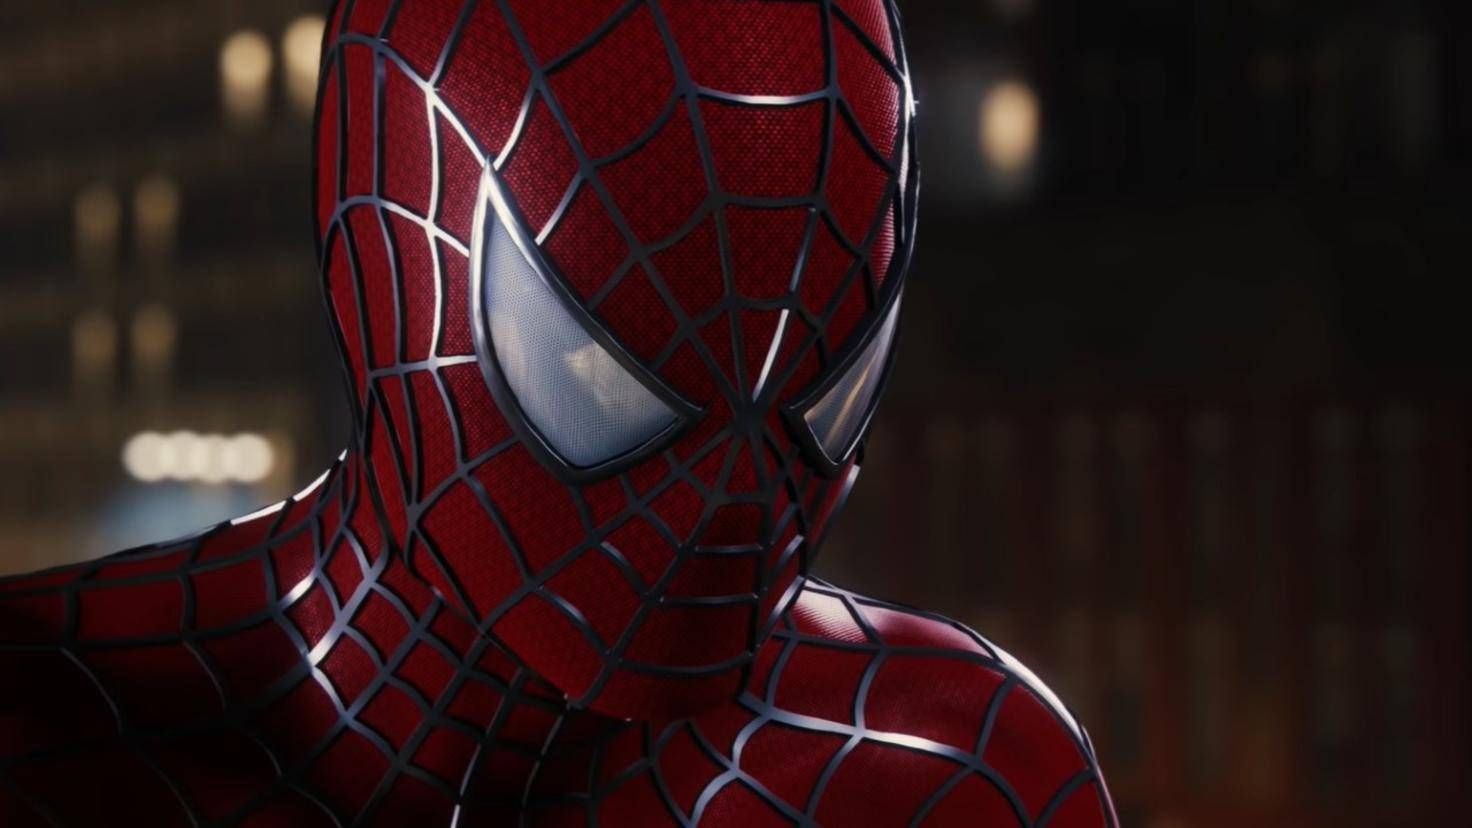 spider-man-ps4-raimi-anzug-screenshot